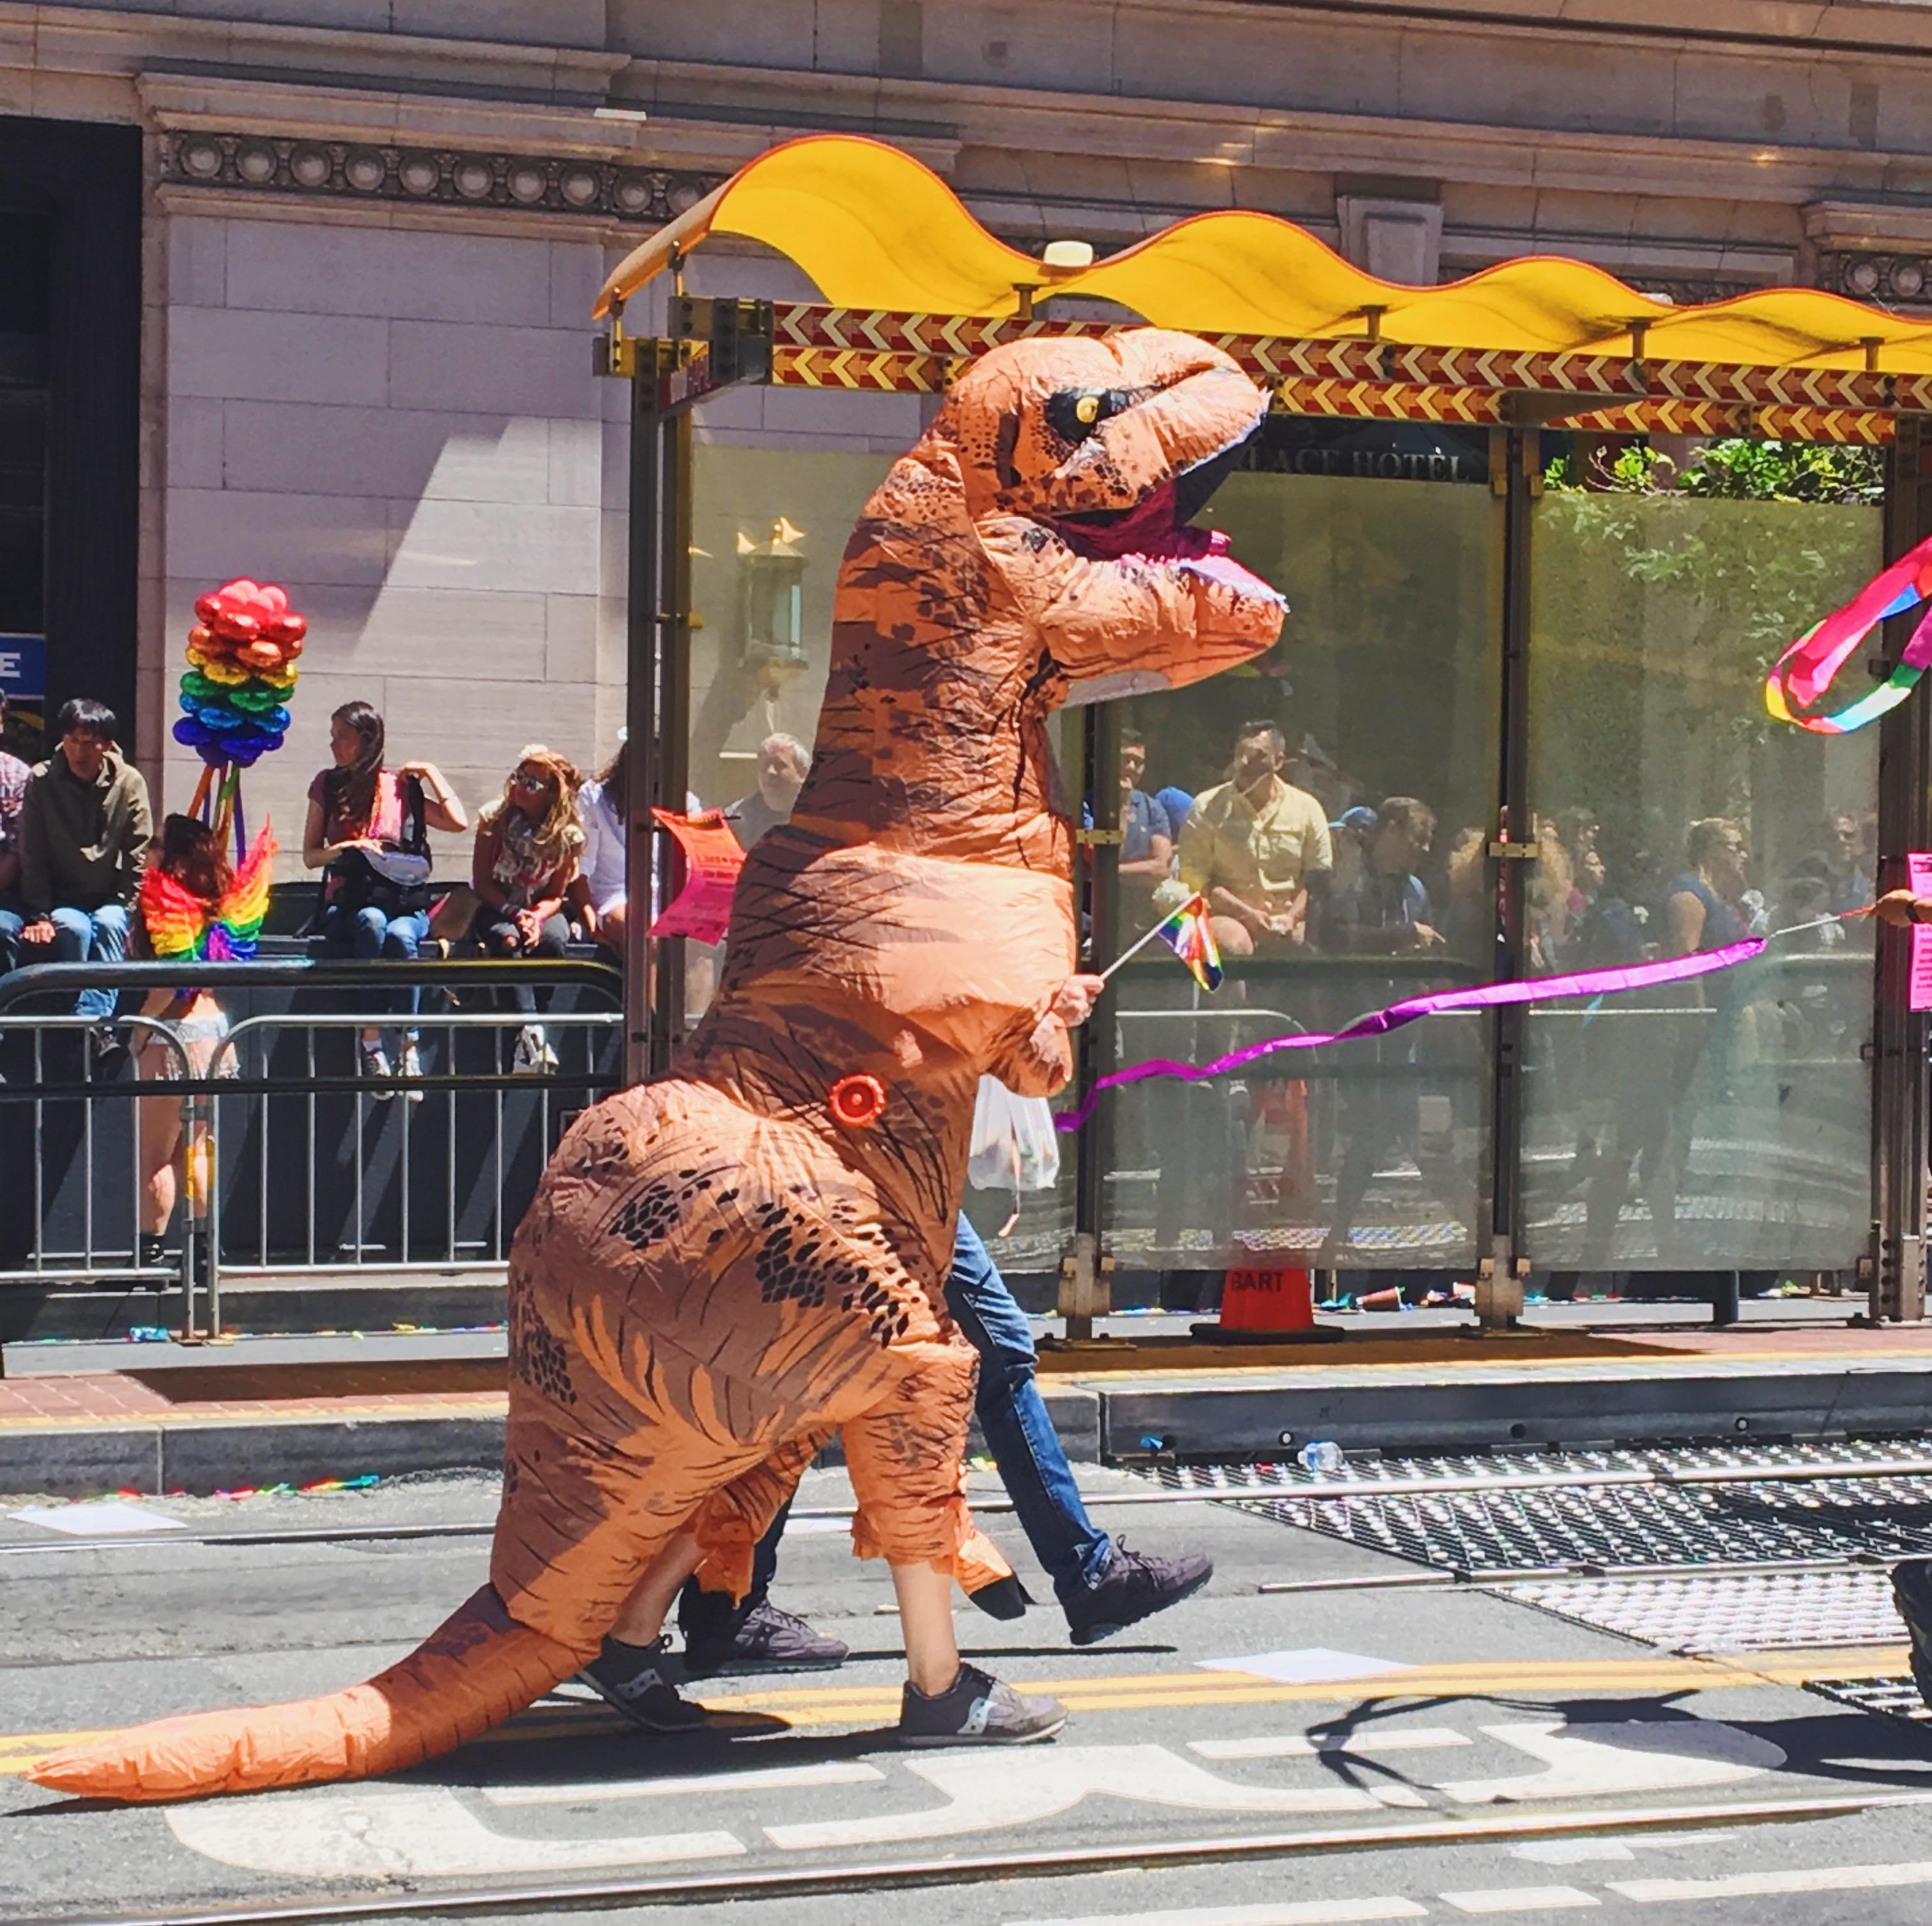 Un t-rex al gay pride - L'evento migliore di San Francisco - la LGBTQ Pride Parade